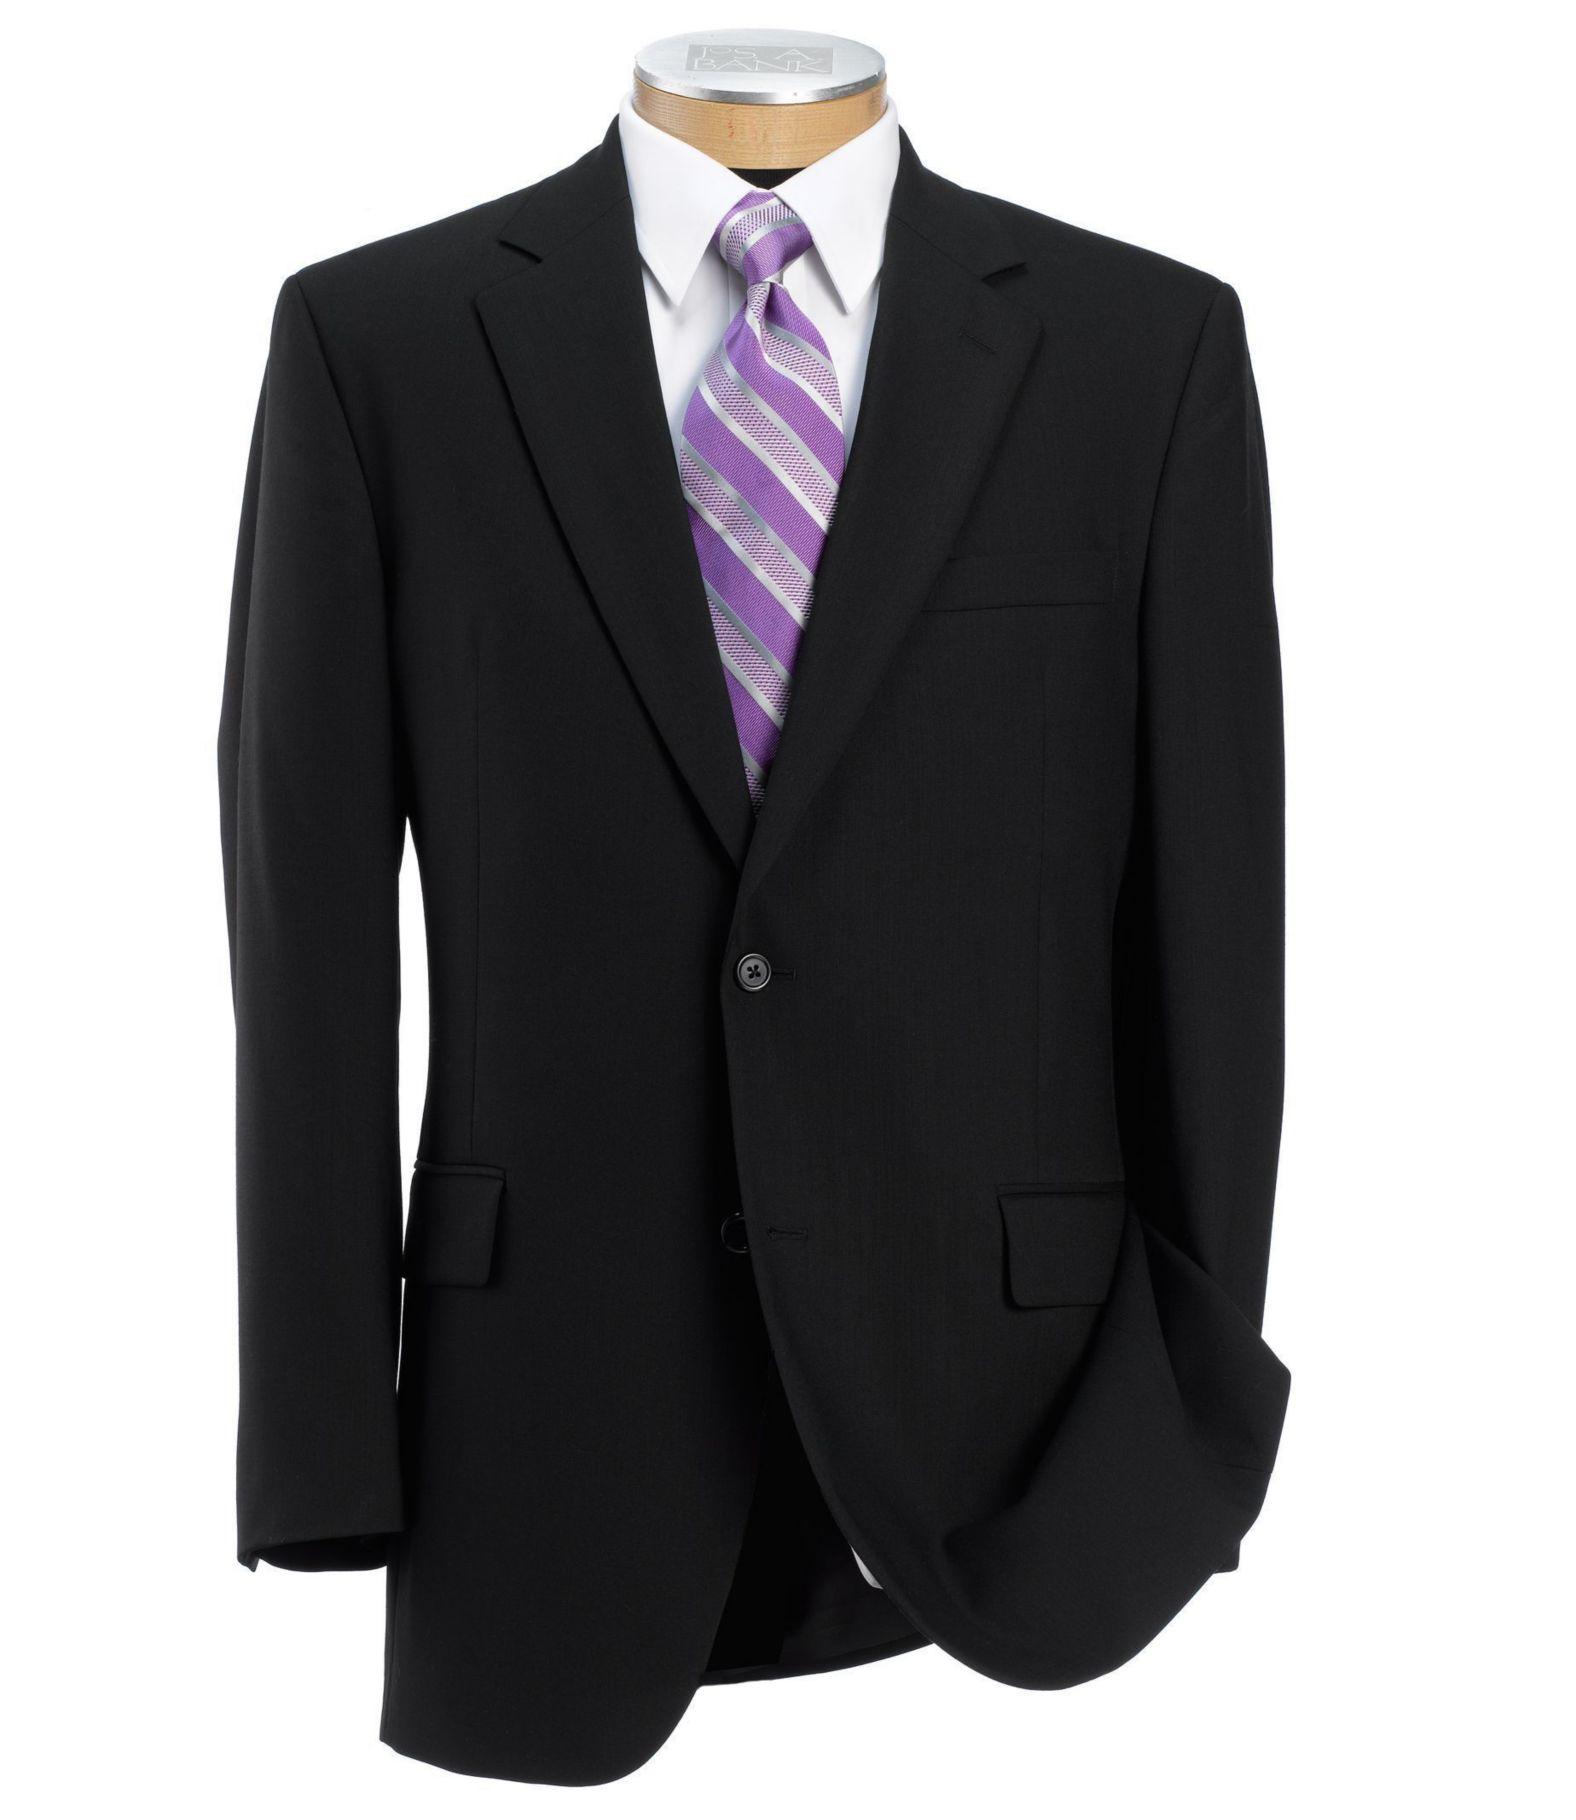 1576x1820 > Suit Wallpapers